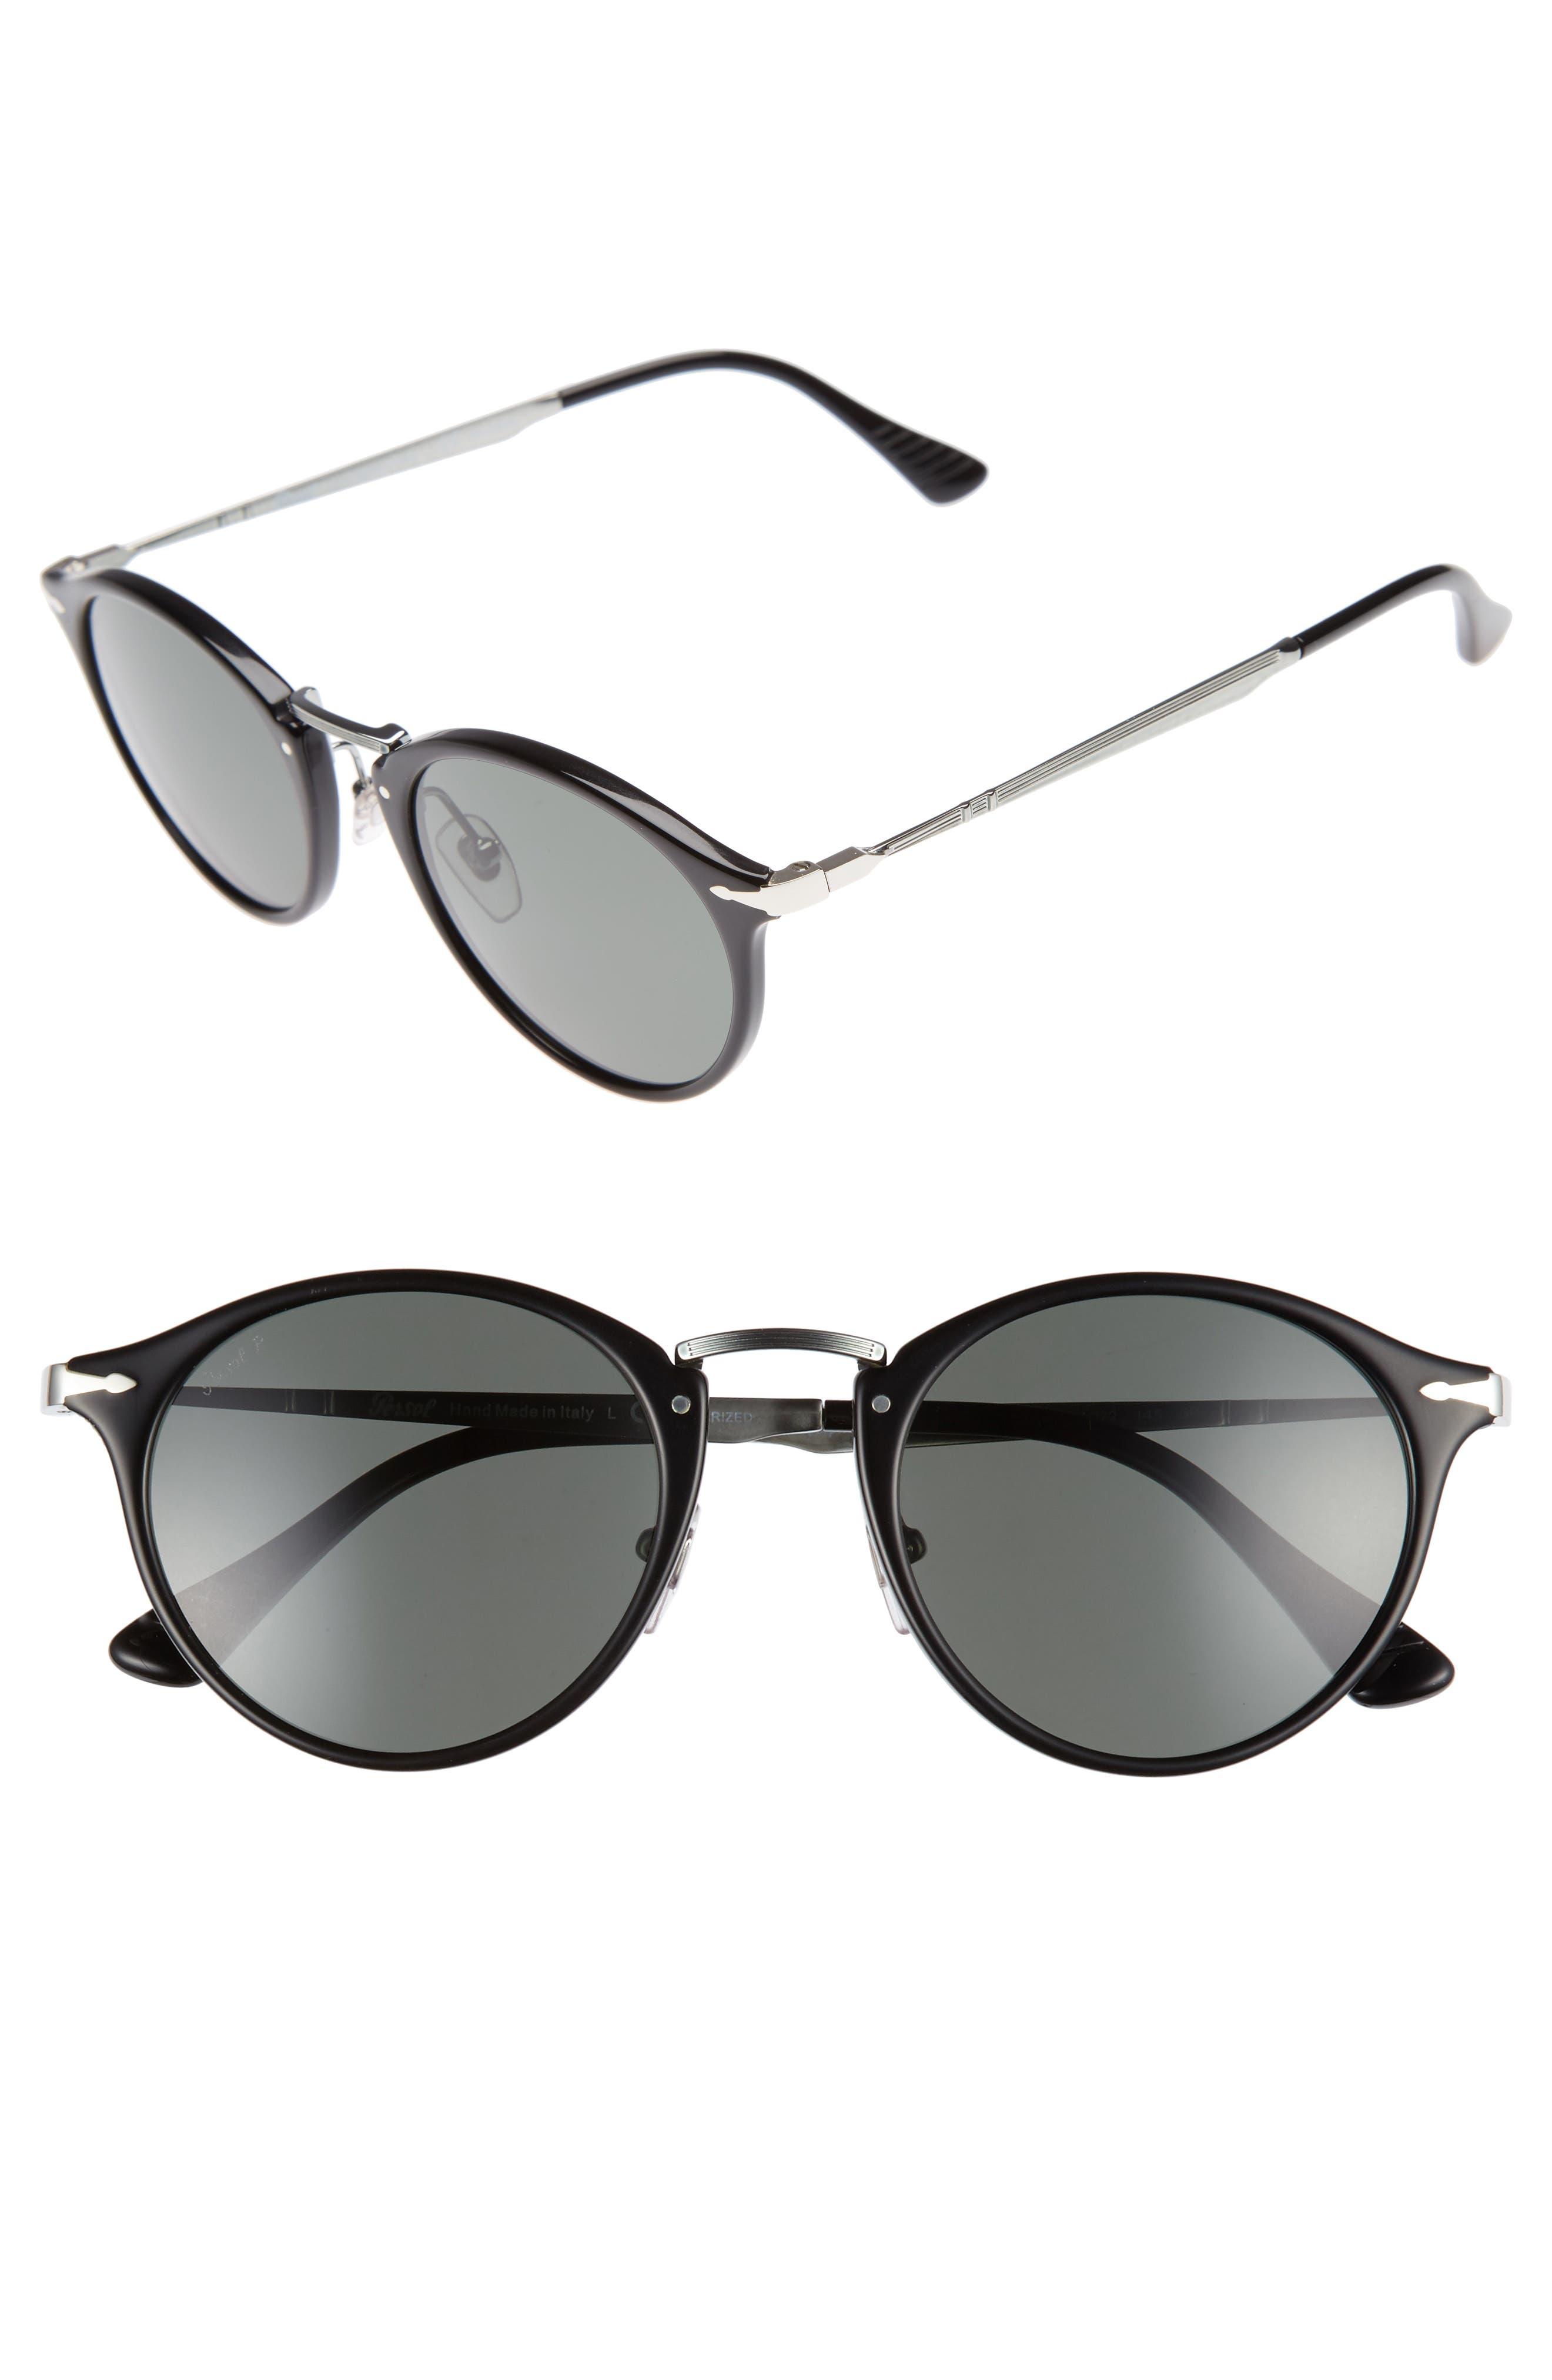 Sartoria Typewriter 51mm Polarized Sunglasses,                         Main,                         color, 001